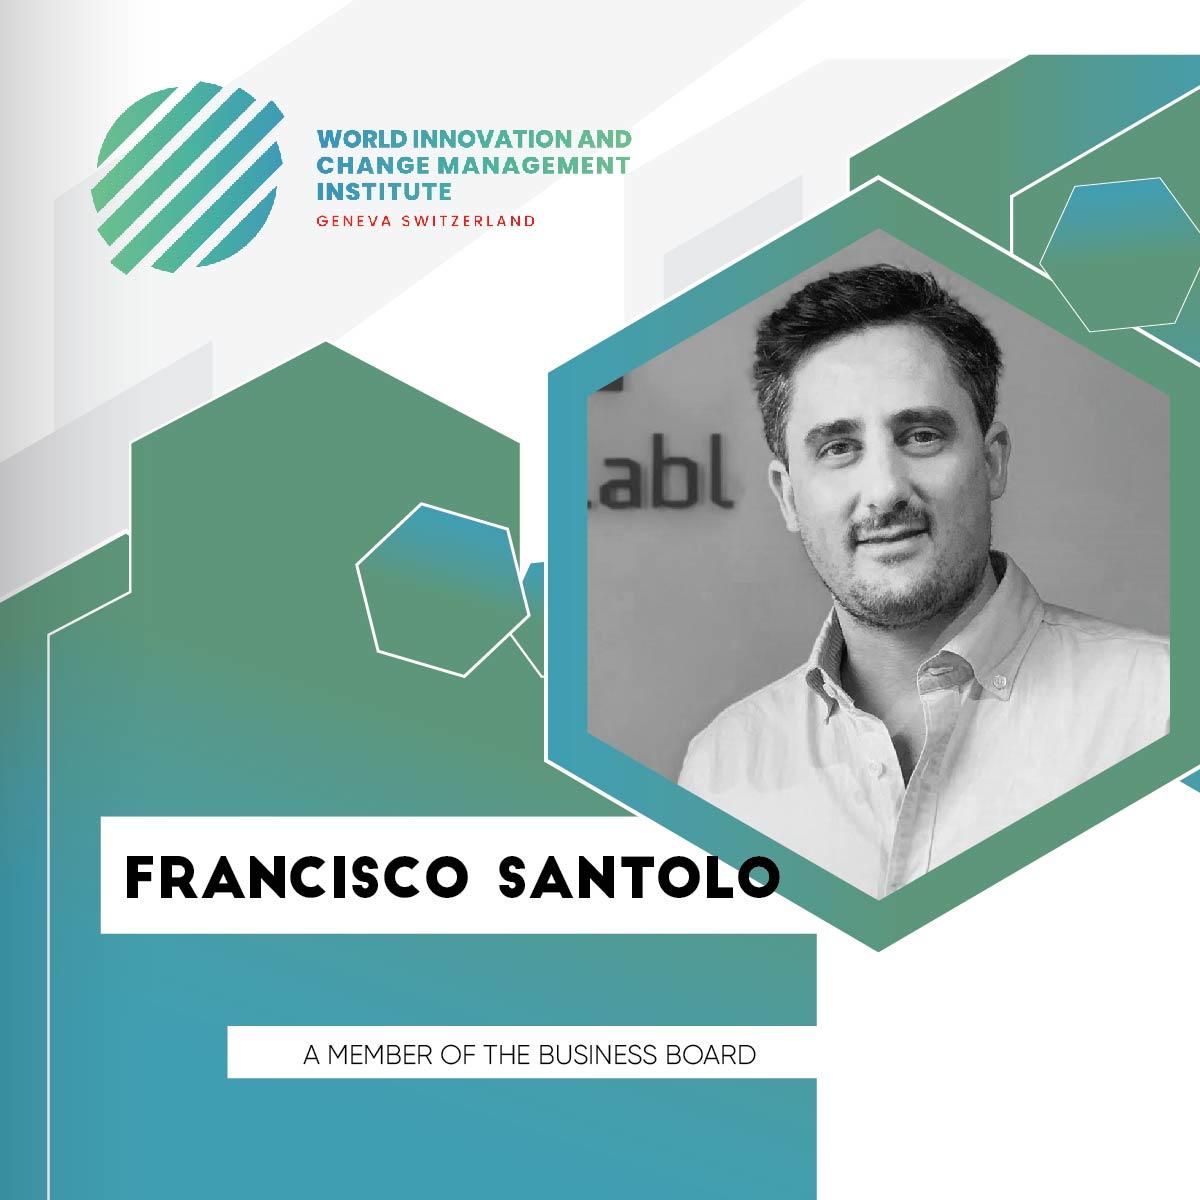 Dr Francisco Santolo